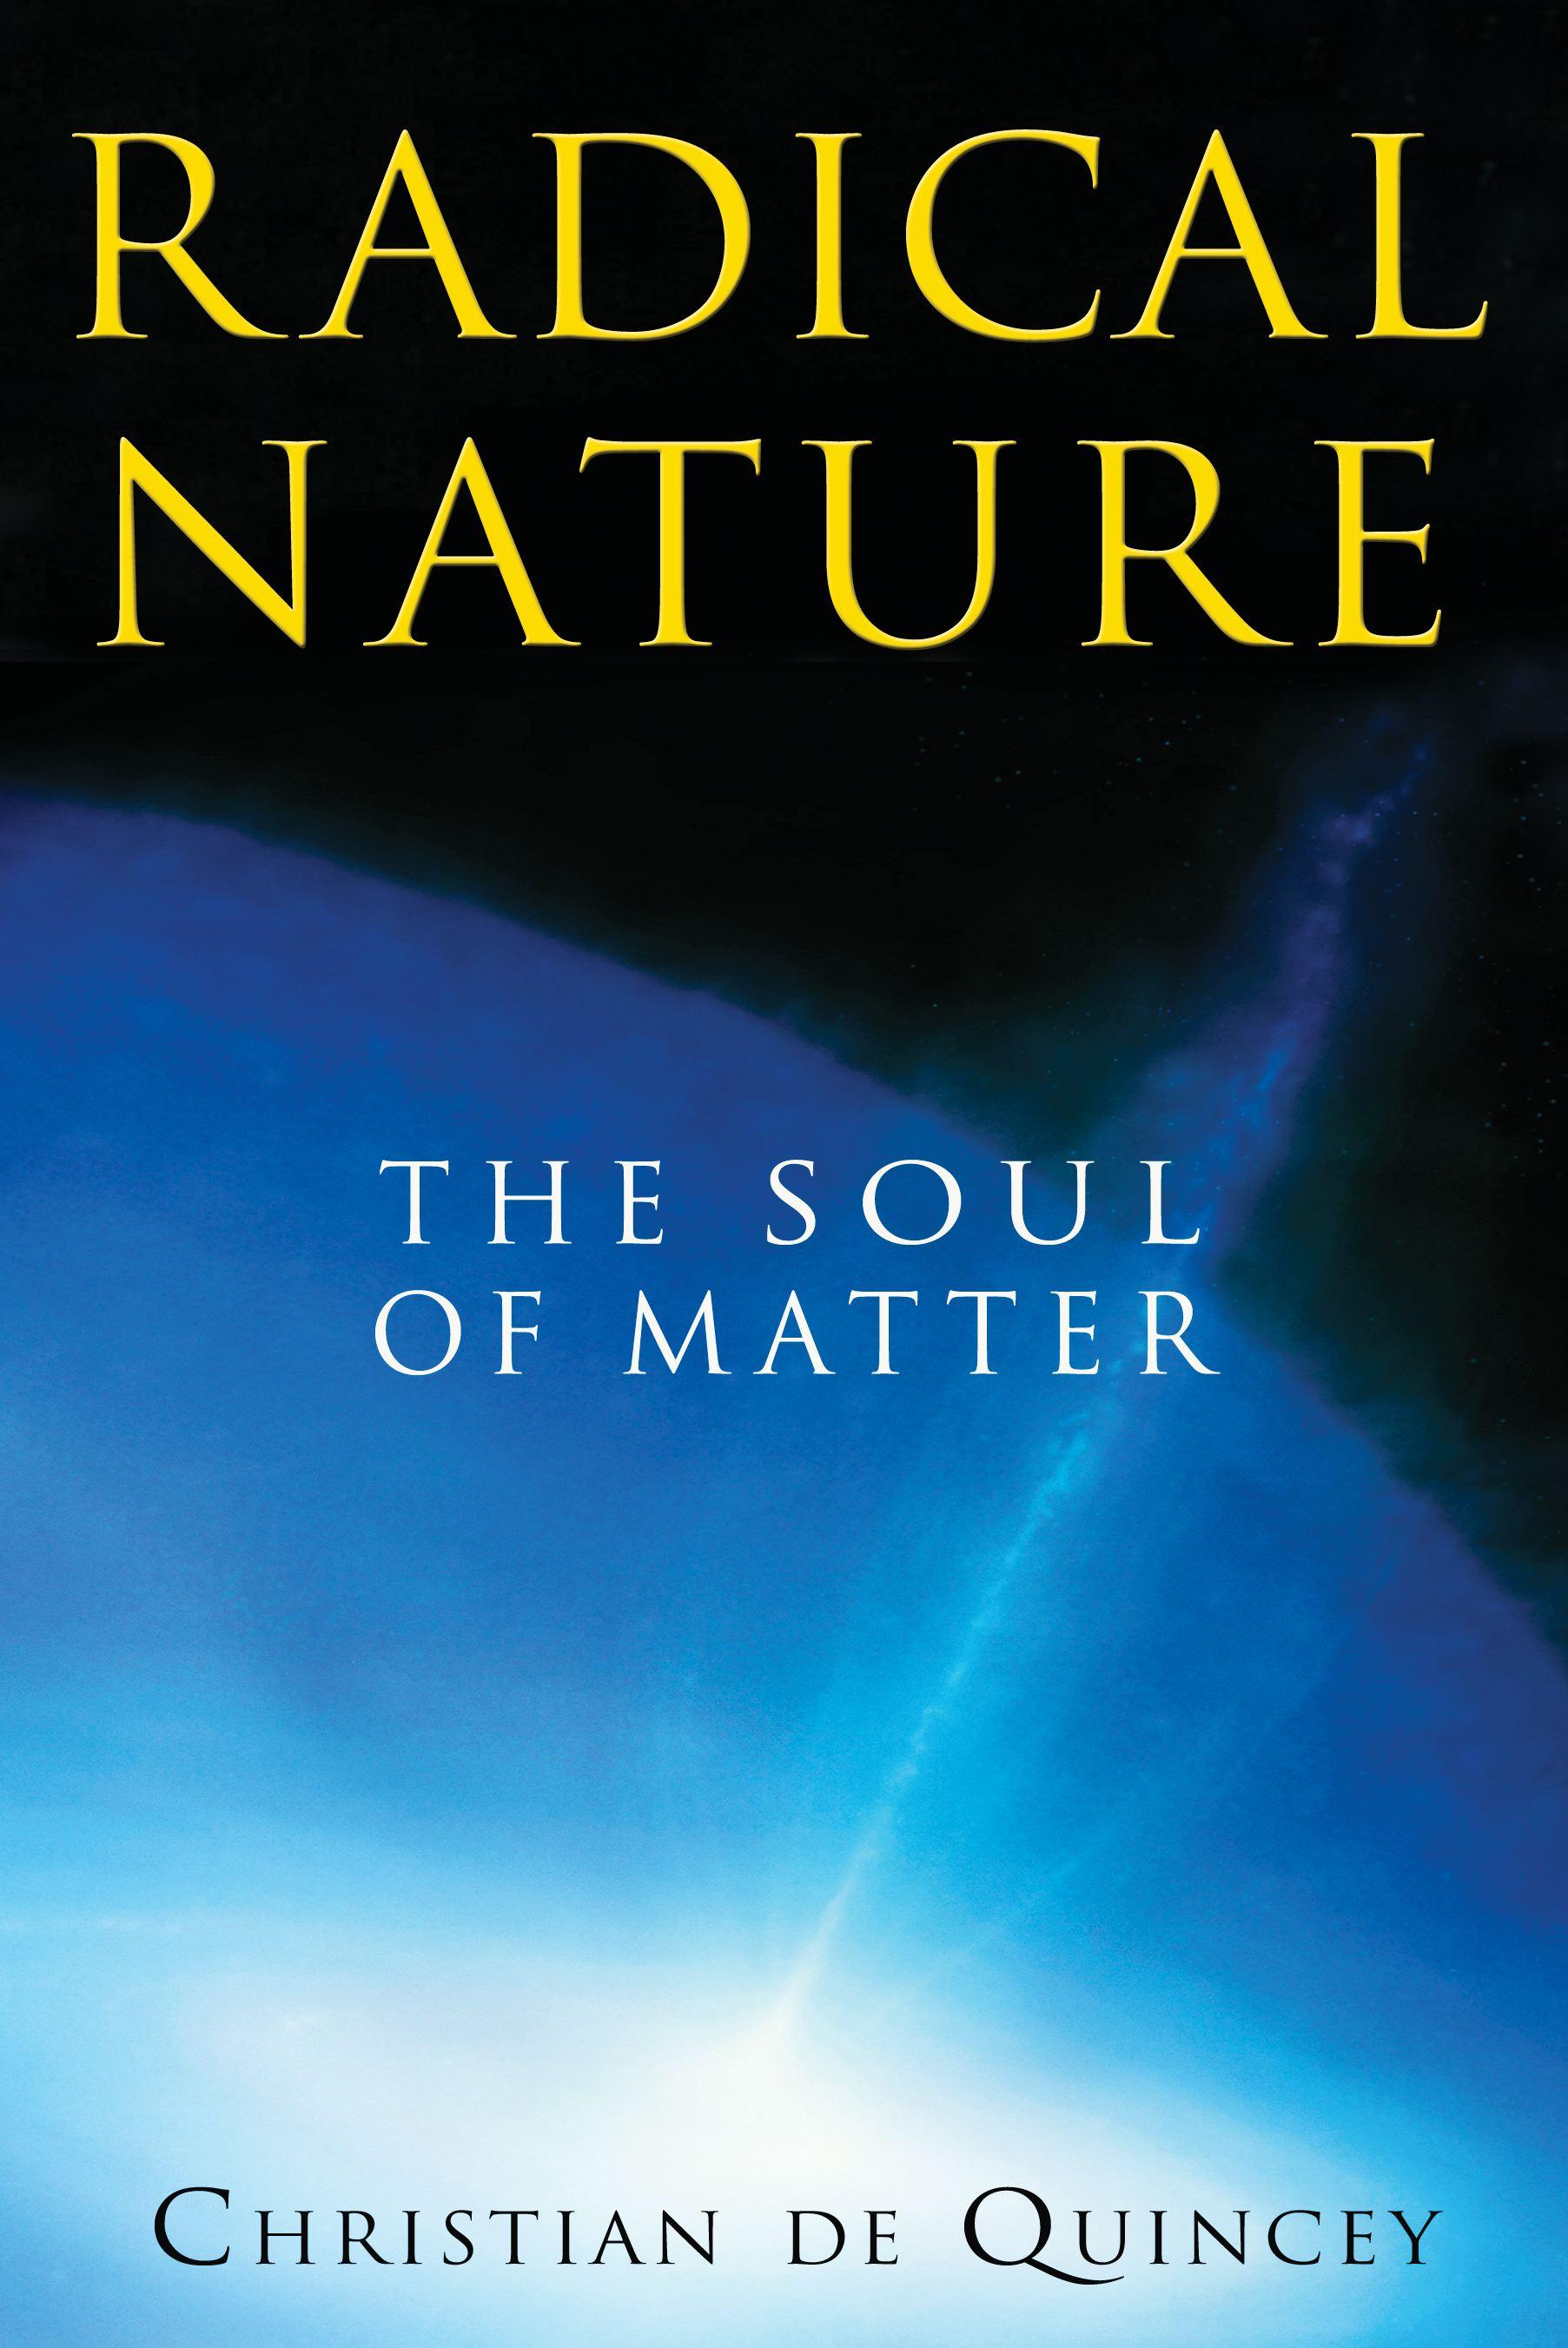 Radical nature 9781594773402 hr